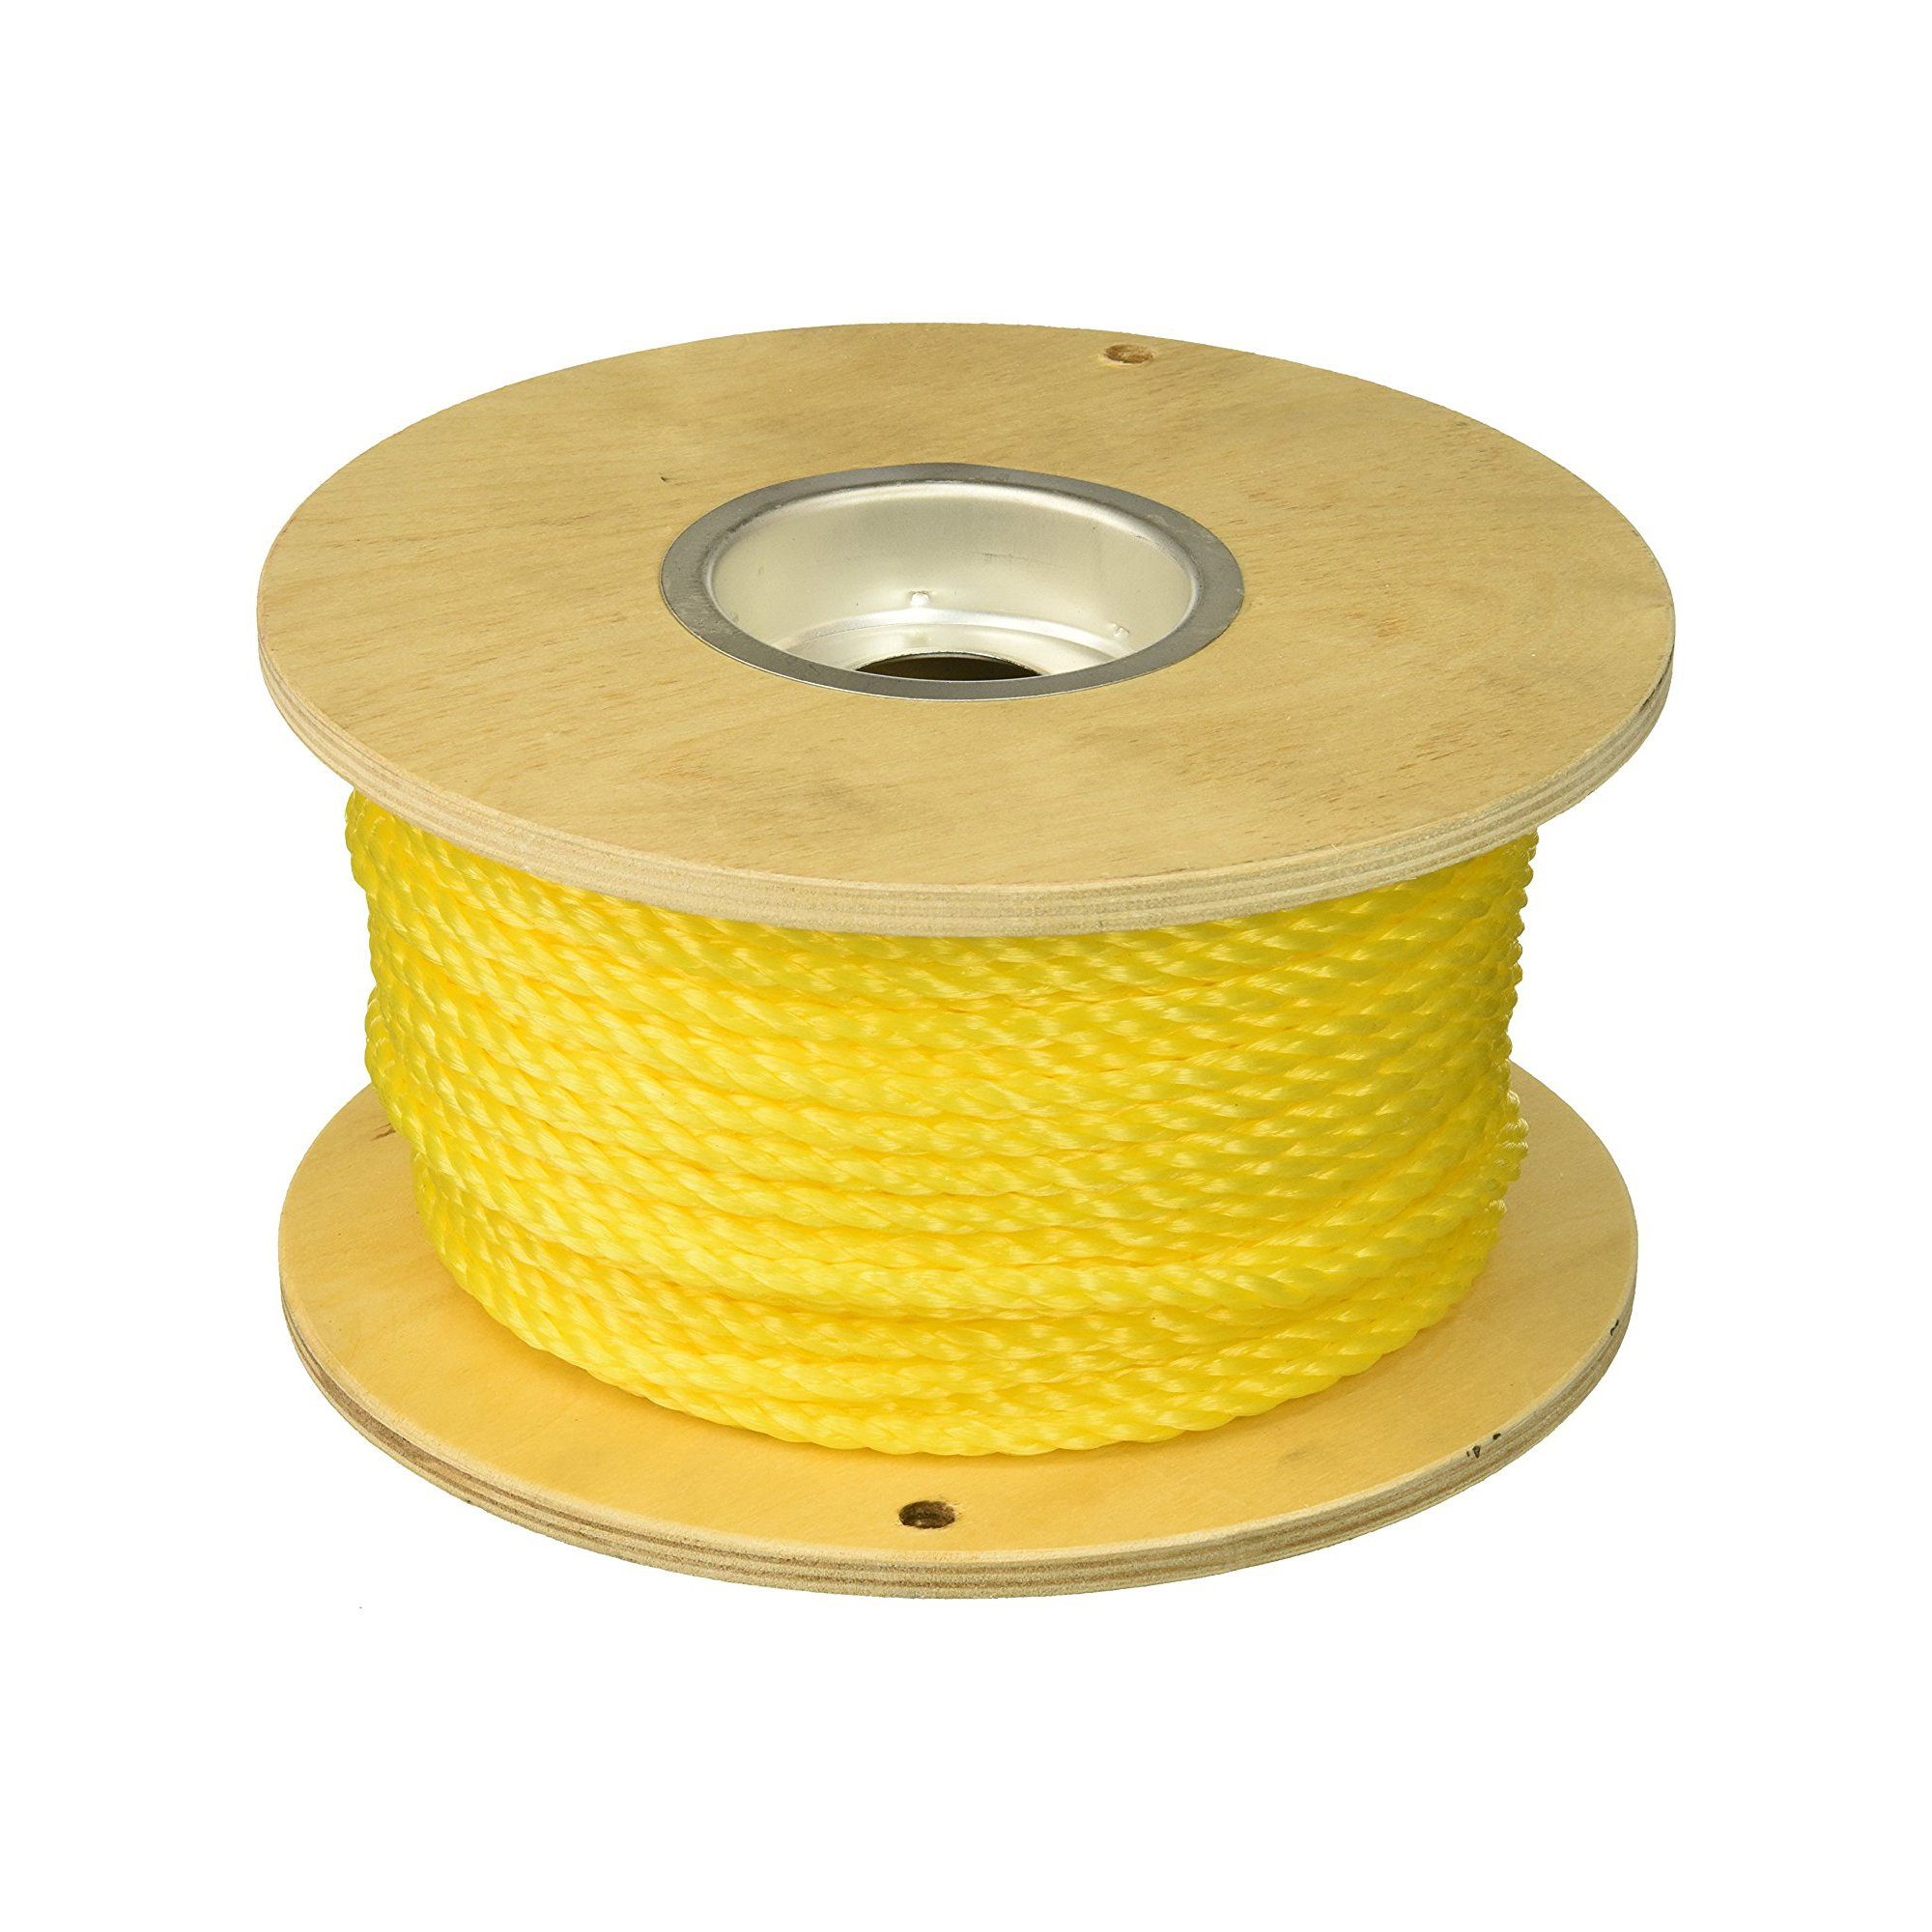 Gardner Bender RGP-3825 Poly-Pro General Purpose Rope, ⅜ in. x 250 ft., 243 lbs. Work Load, Manual Pulling, 1 Reel, Yellow